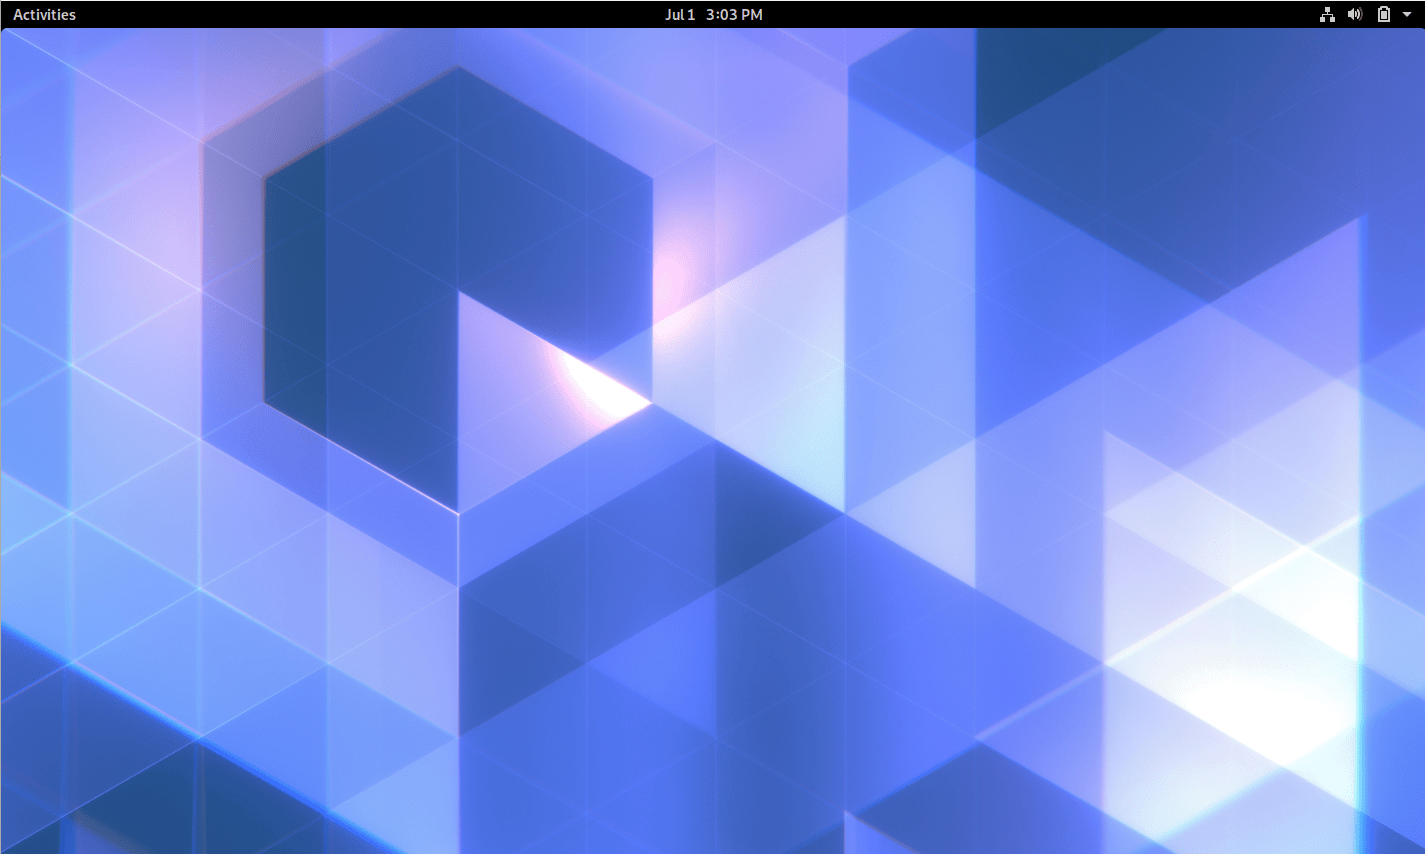 Log In to New Desktop in Ubuntu